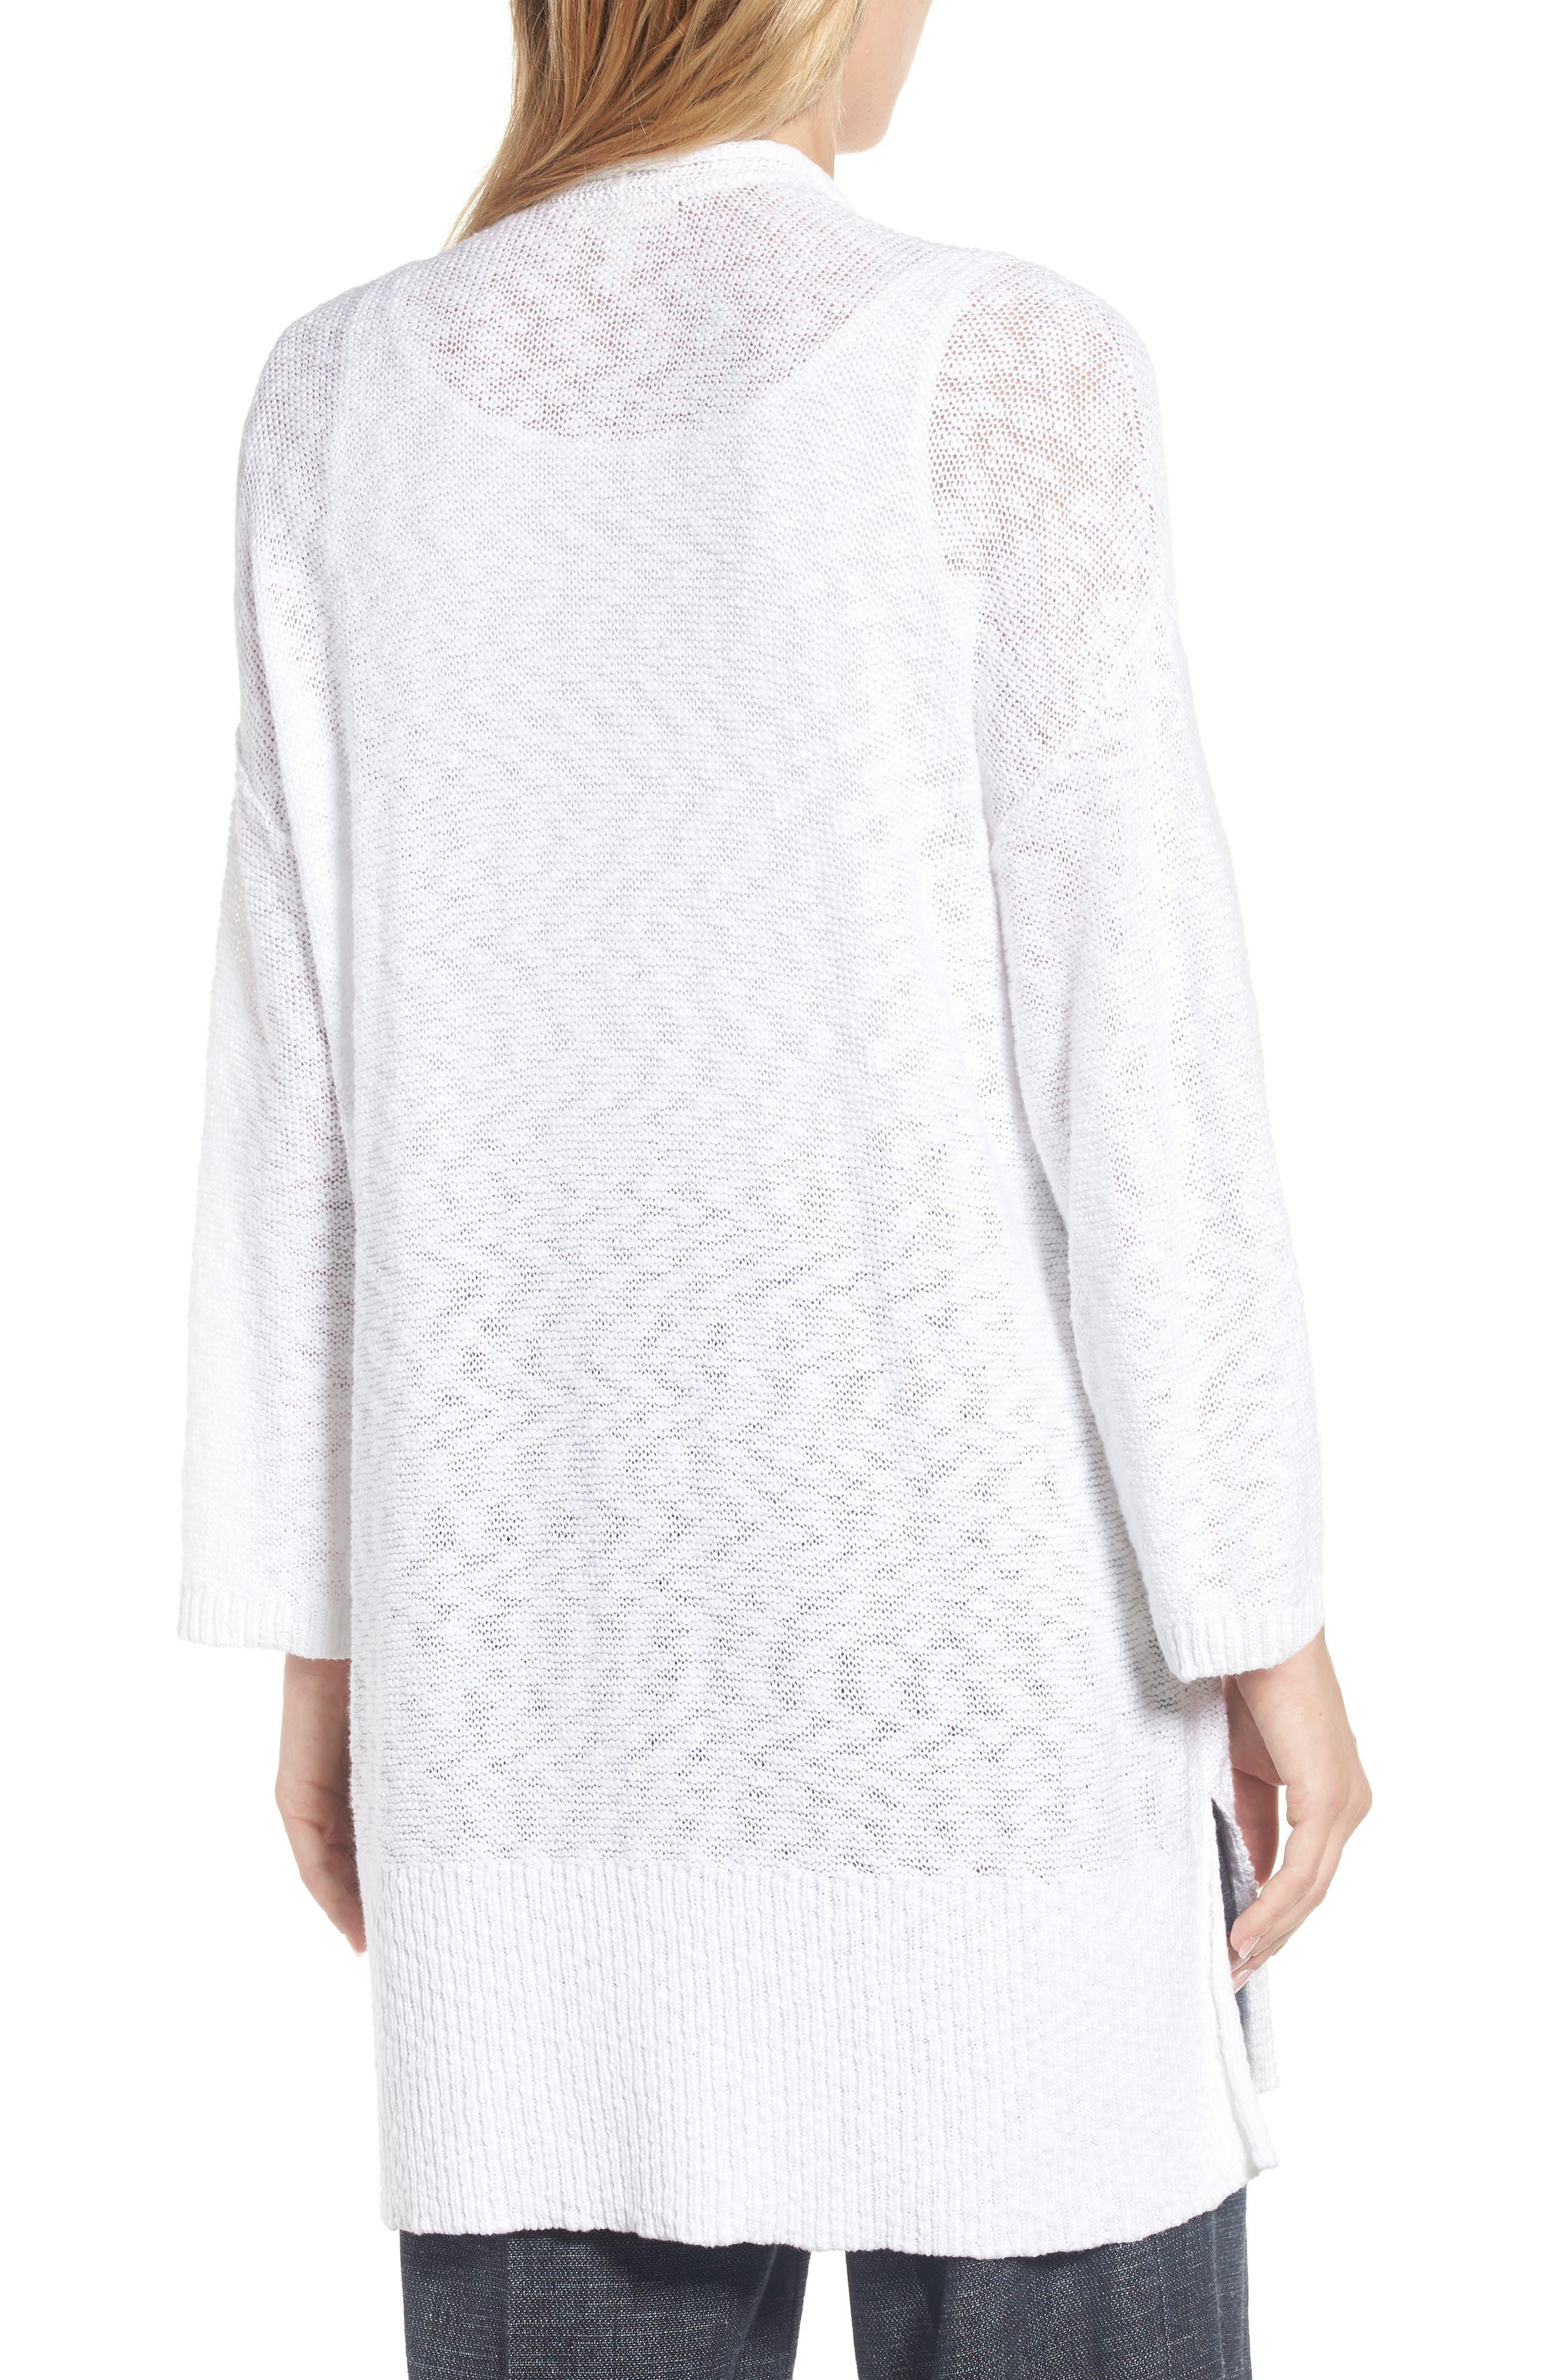 Long Organic Cotton Cardigan,                             Alternate thumbnail 2, color,                             White